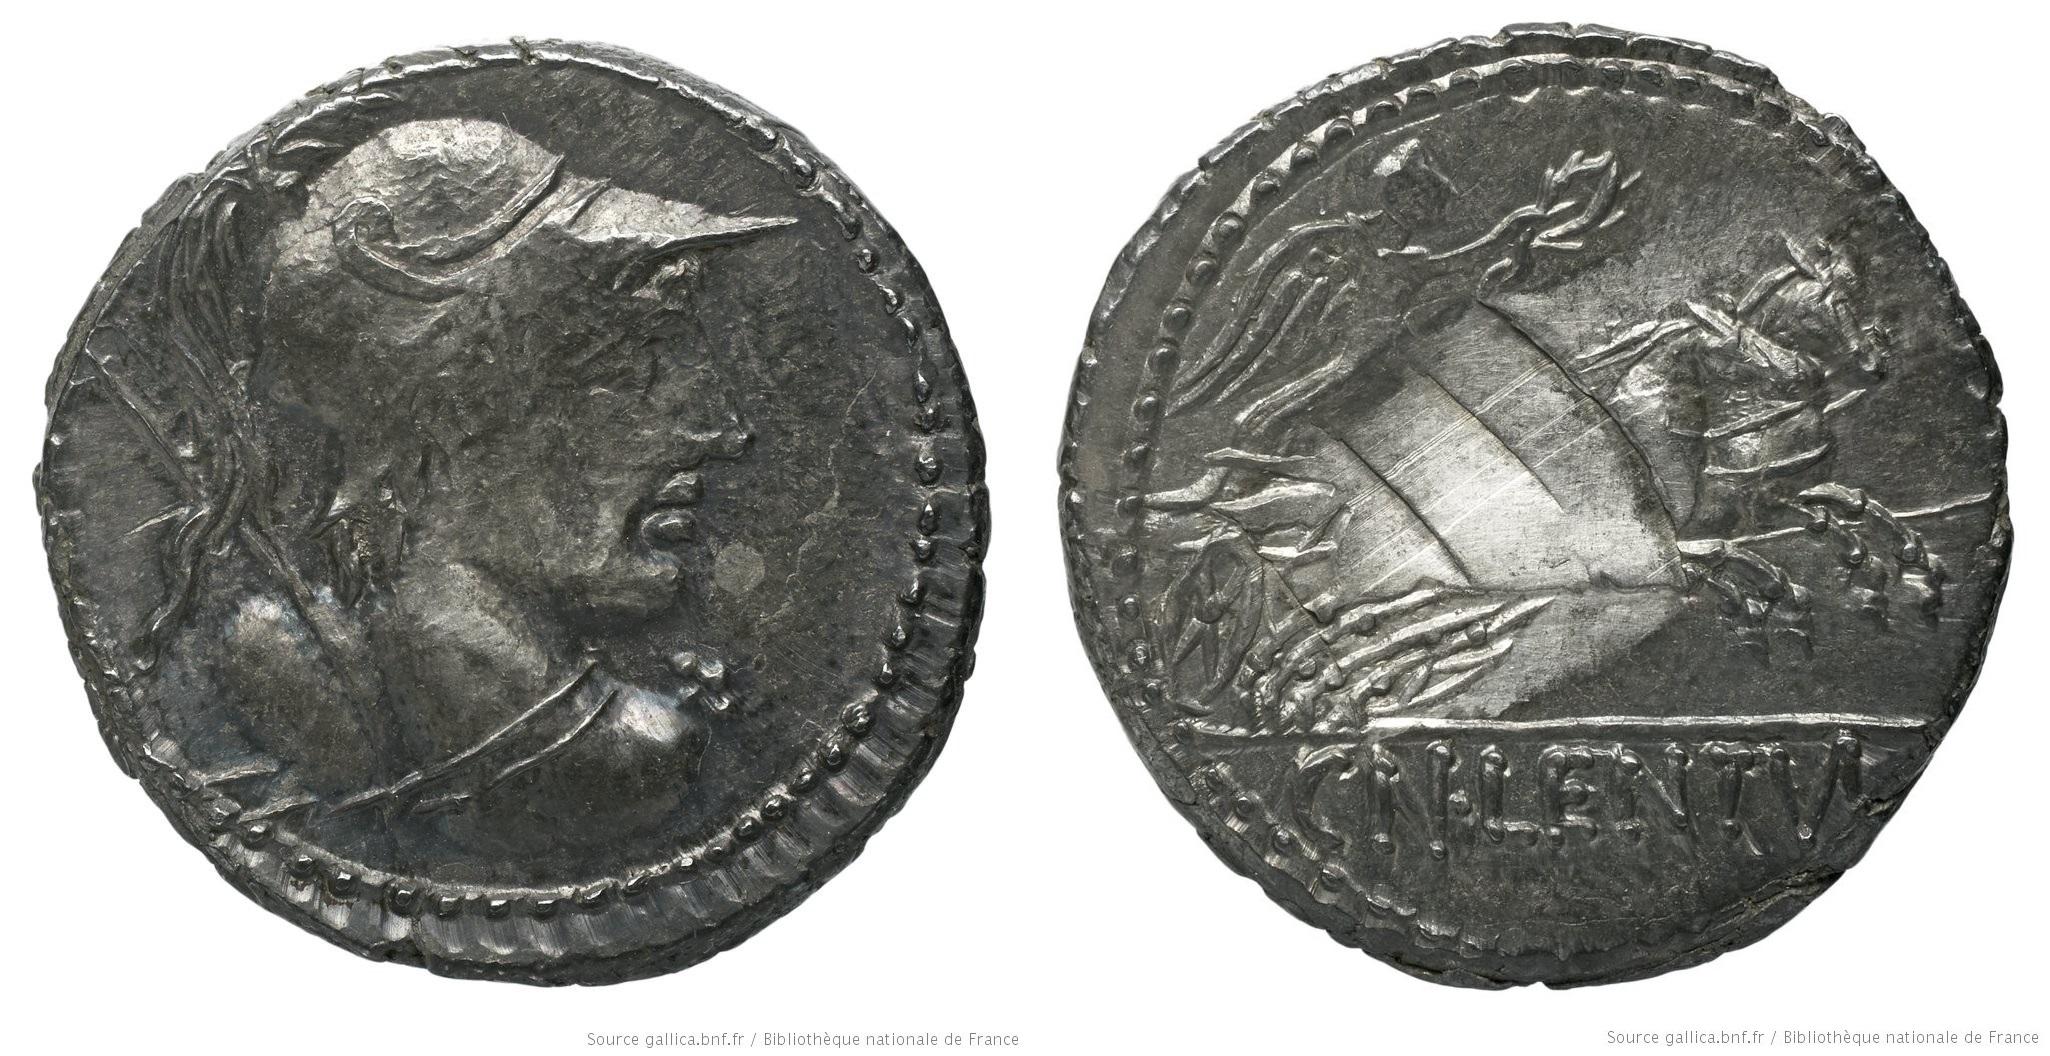 1241CO – Denier Cornelia – Cnæus Cornelius Lentulus Marcellinus